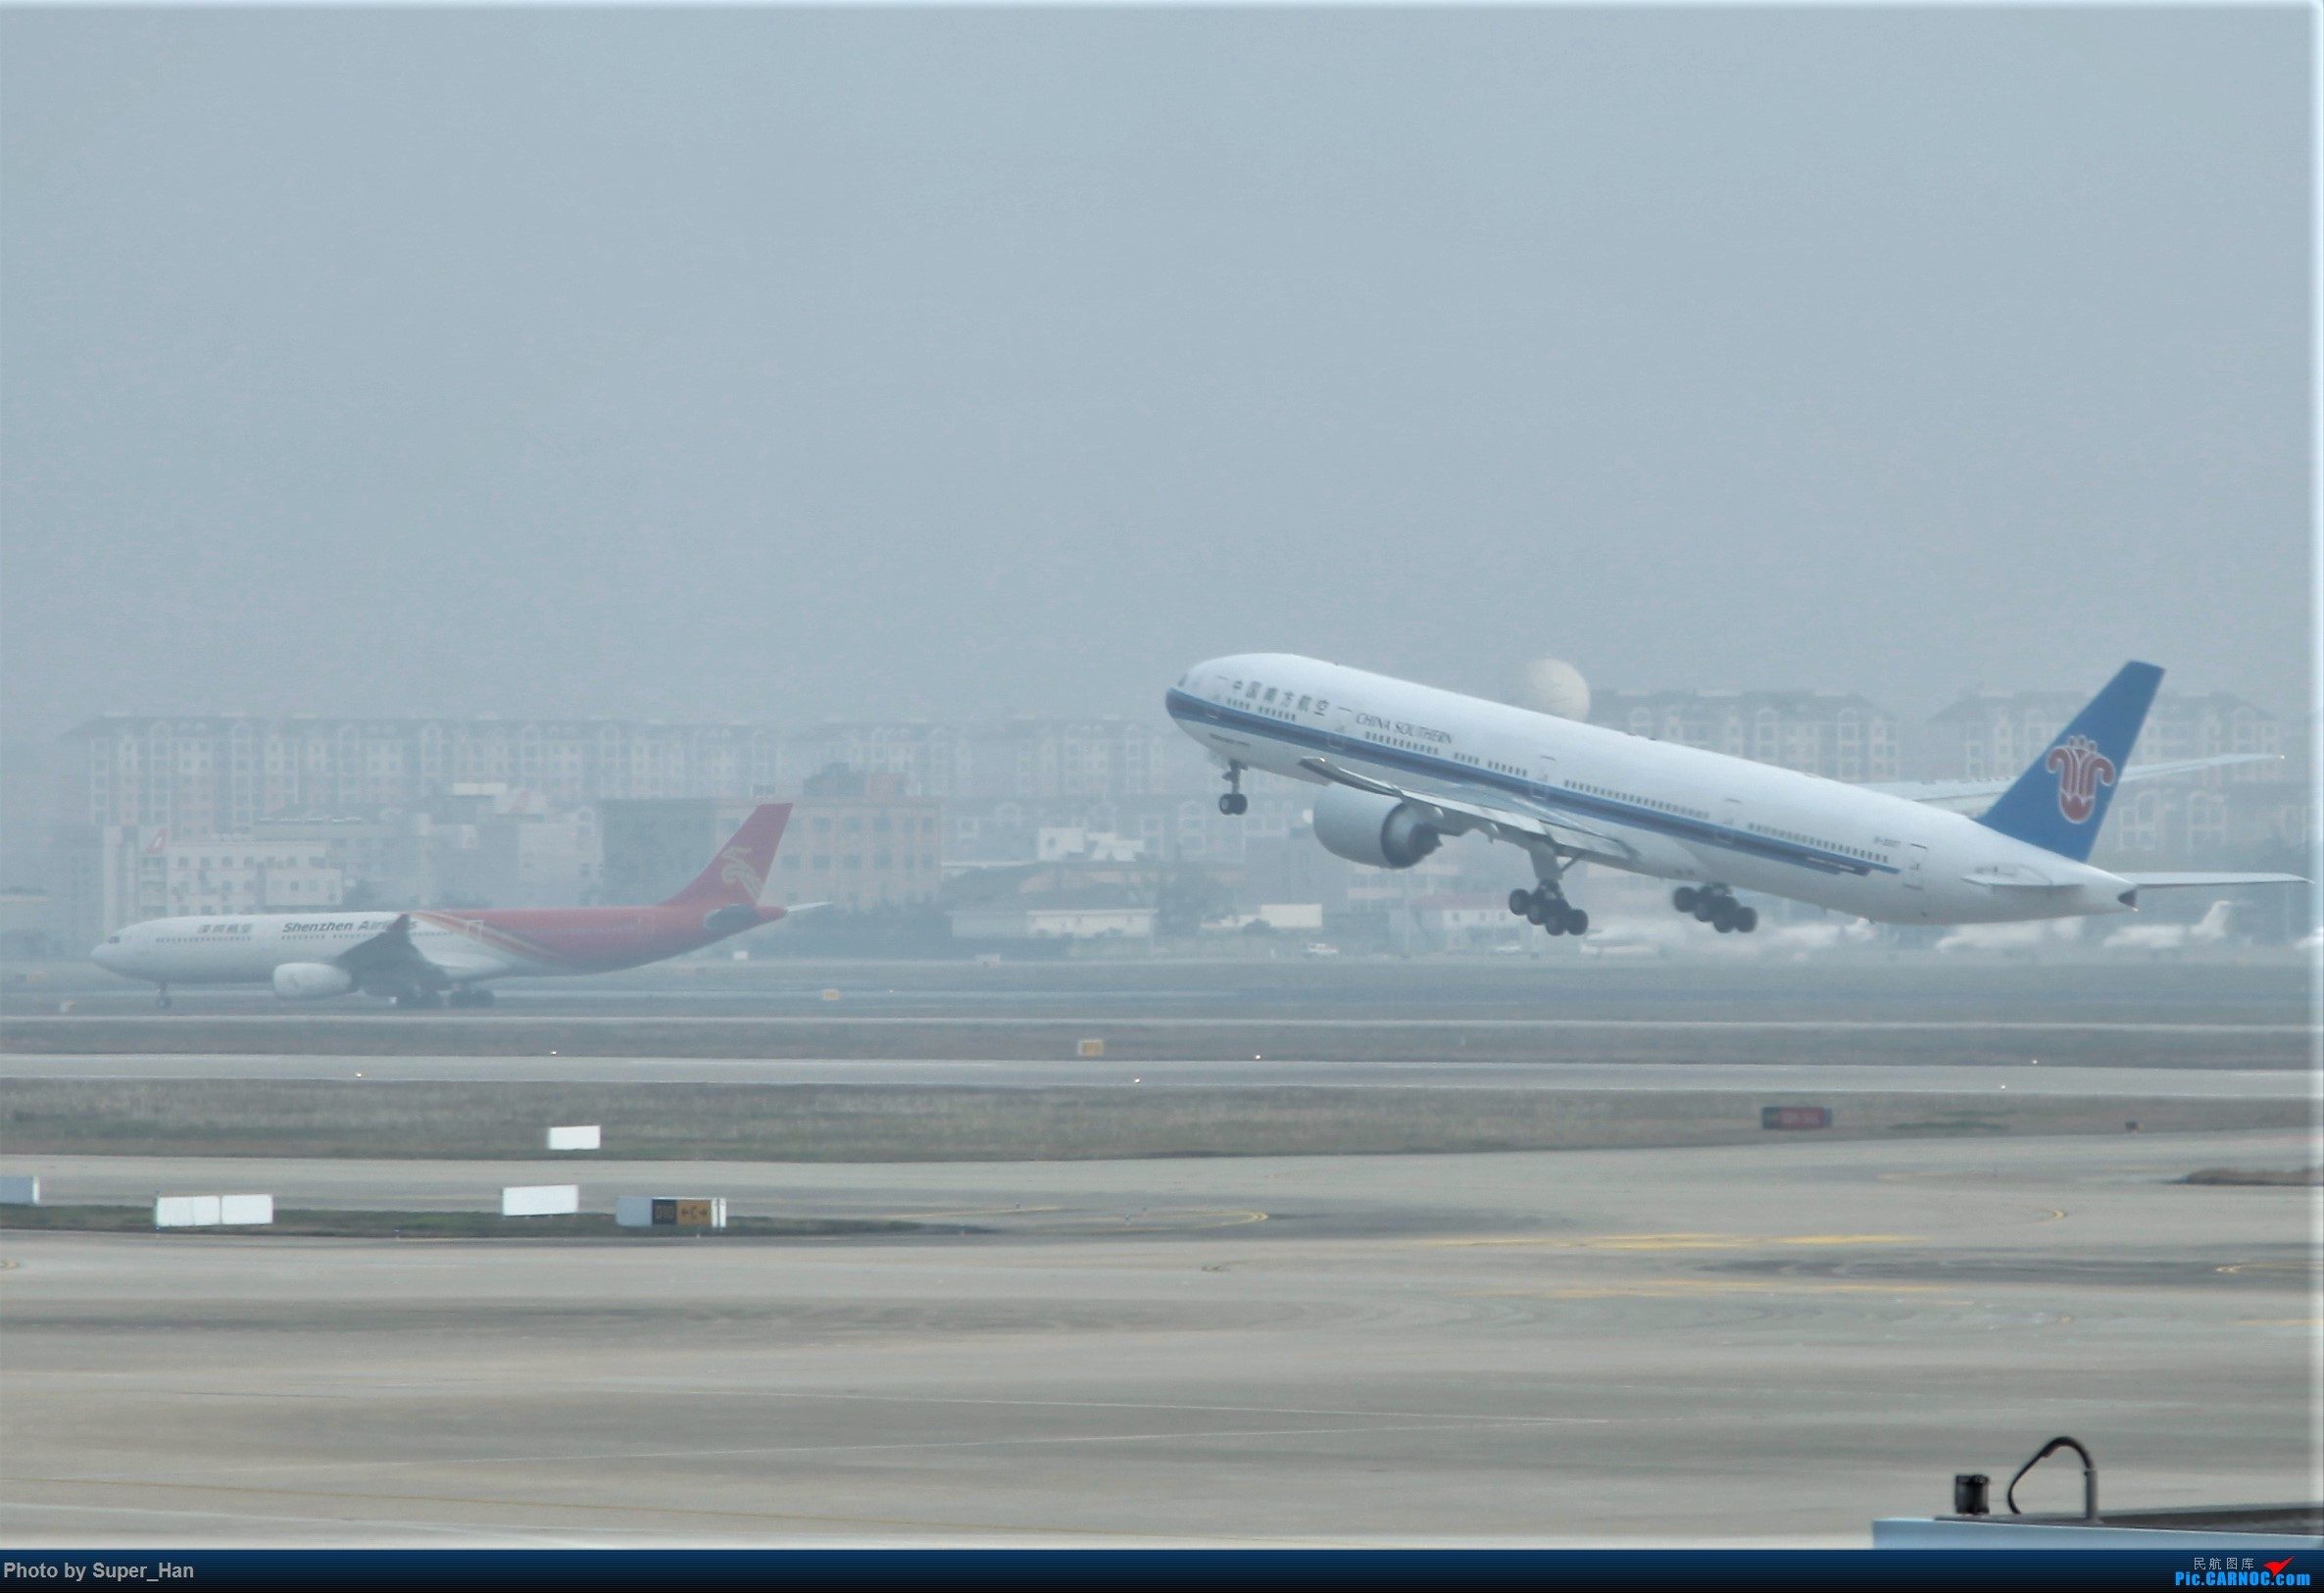 Re:[原创]2019虹桥出发飞北京第一拍 BOEING 777-300ER B-2007 中国上海虹桥国际机场